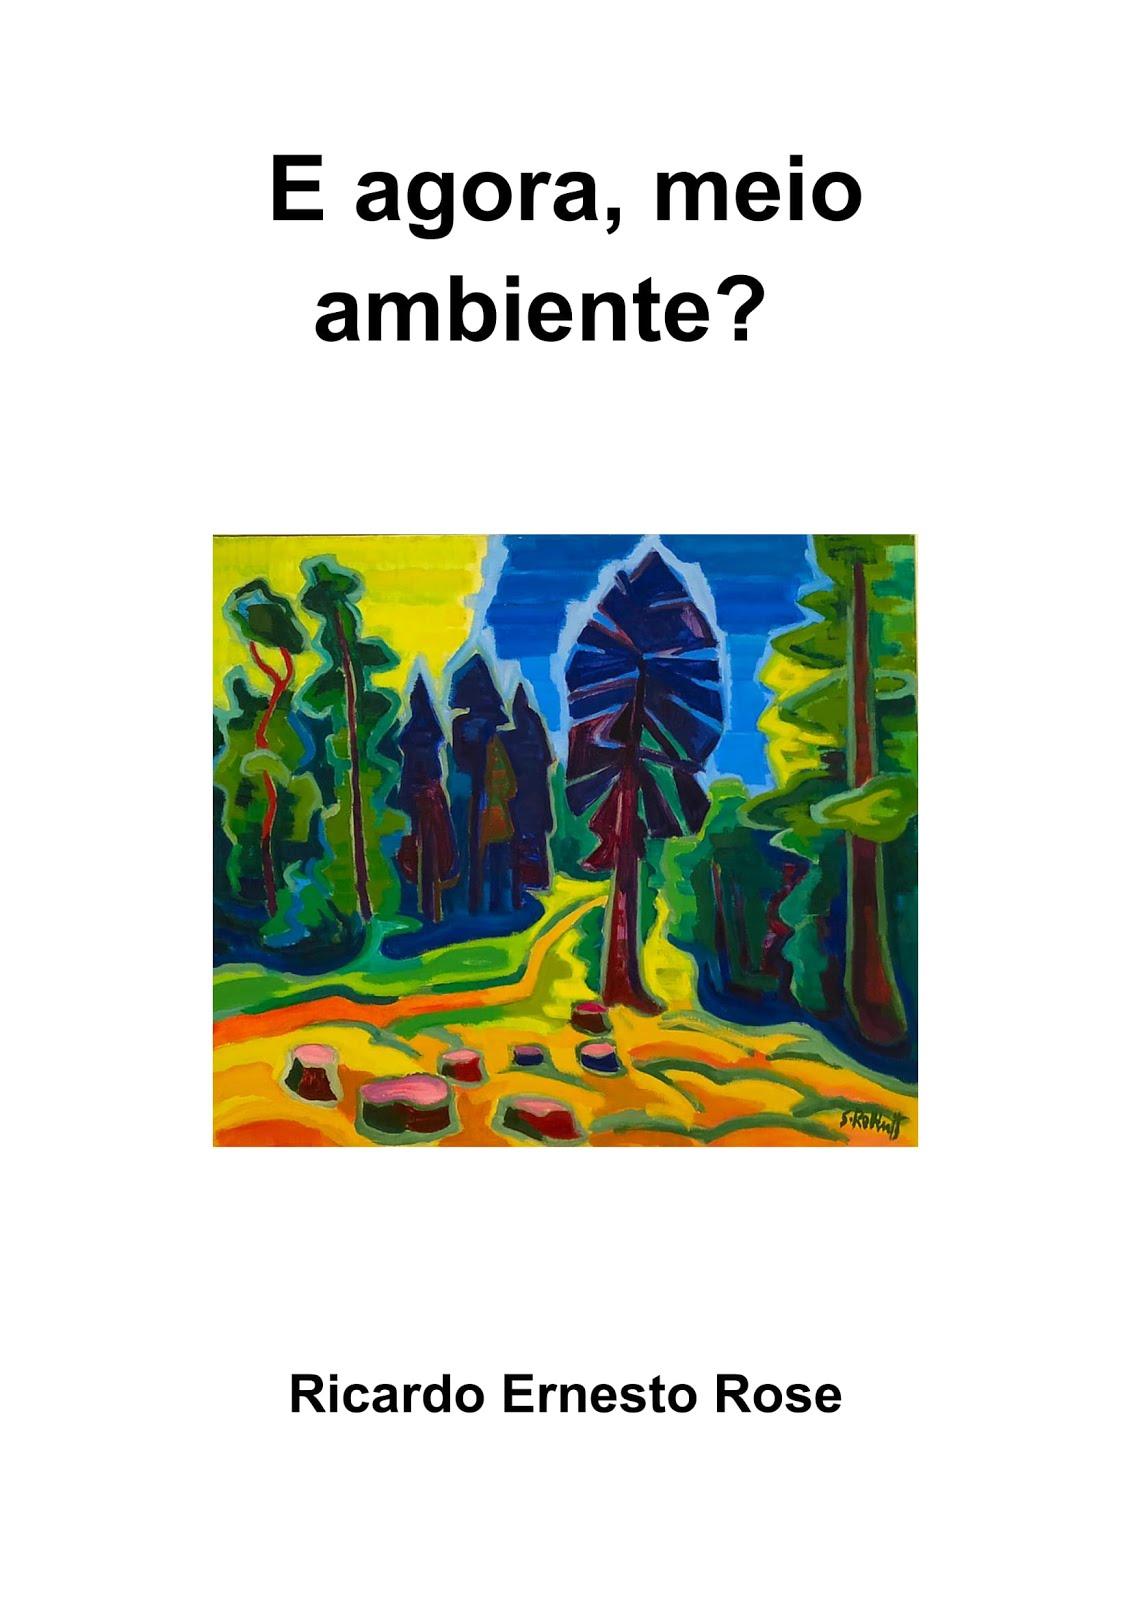 Textos sobre temas ambientais (download)